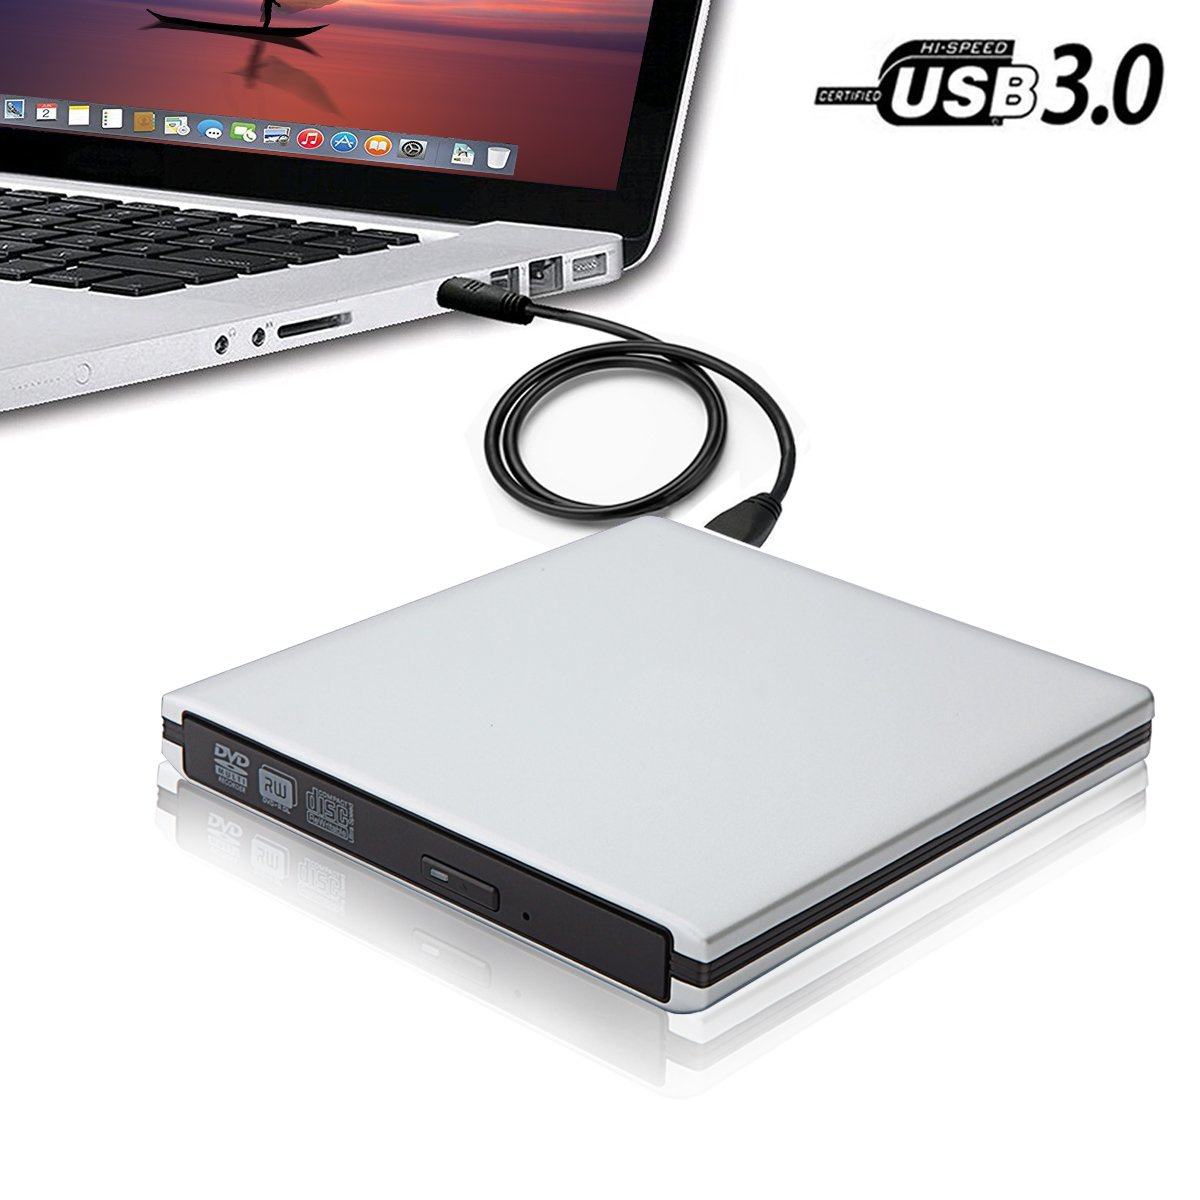 USB3.0 Computer CD DVD External Drive for Laptop Notebook PC Desktop,TENNBOO Portable CD/DVD-RW Burner Writer Player Support Windows XP/ Vista/7/8/2000,Mac,Plug and Play High Speed Data Transfer